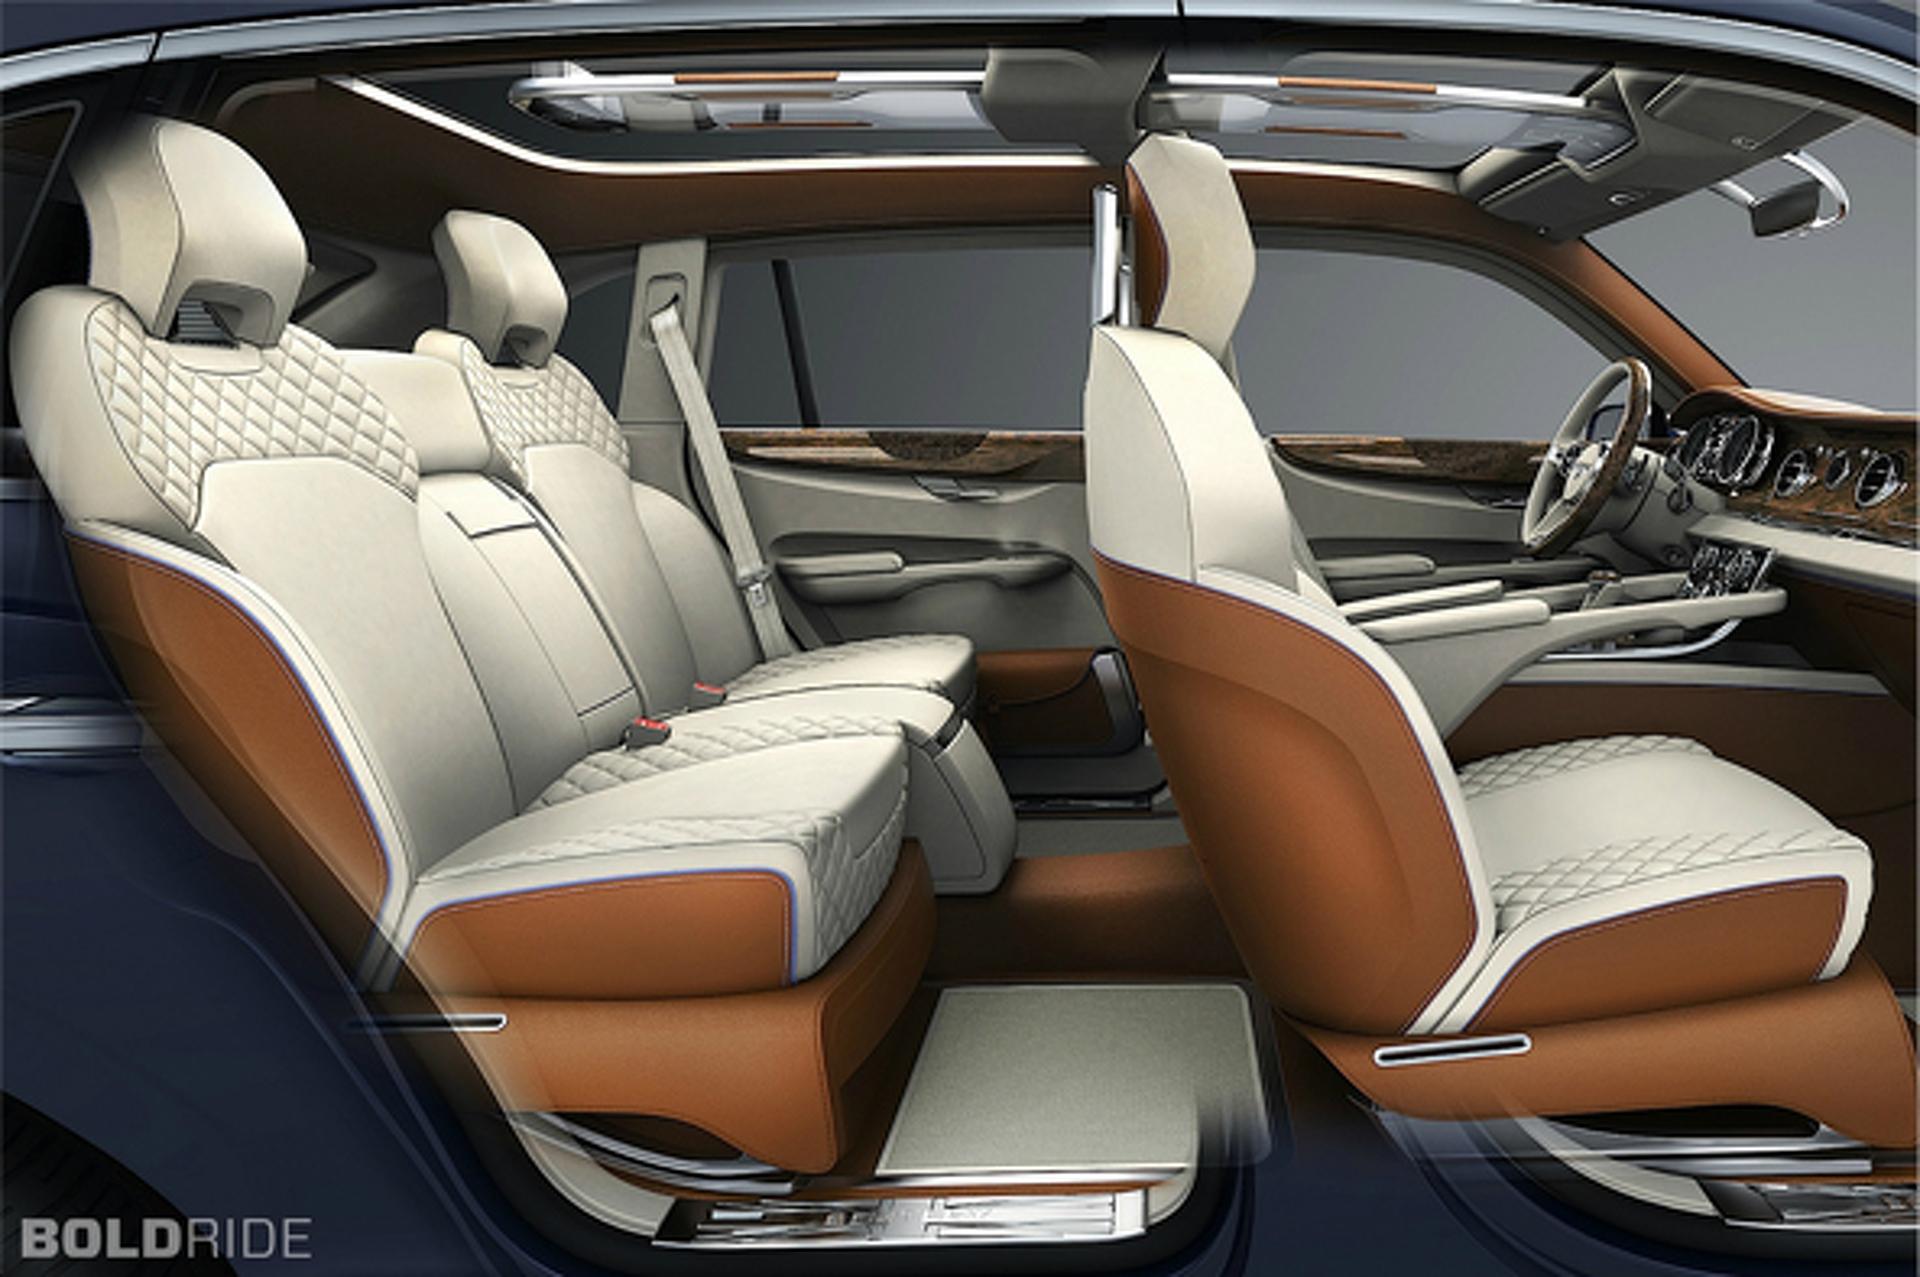 Unveiled: 2012 Bentley EXP 9 F Concept